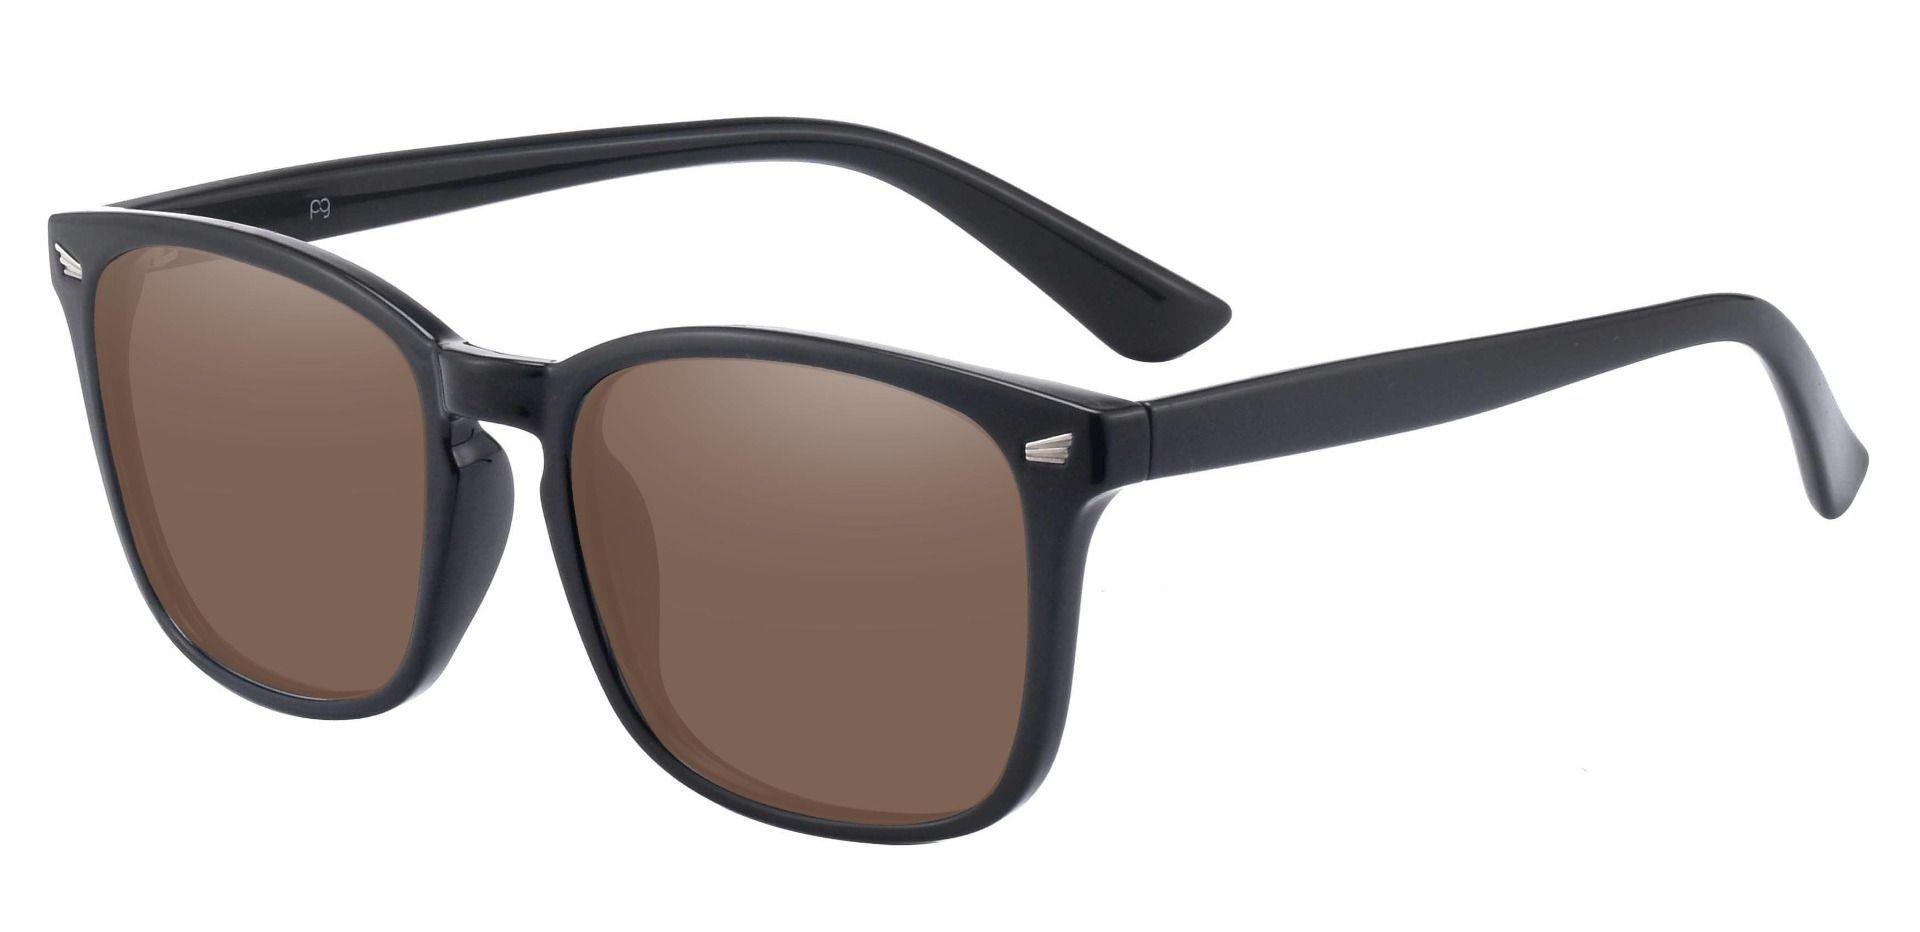 Zen Square Prescription Sunglasses - Black Frame With Brown Lenses